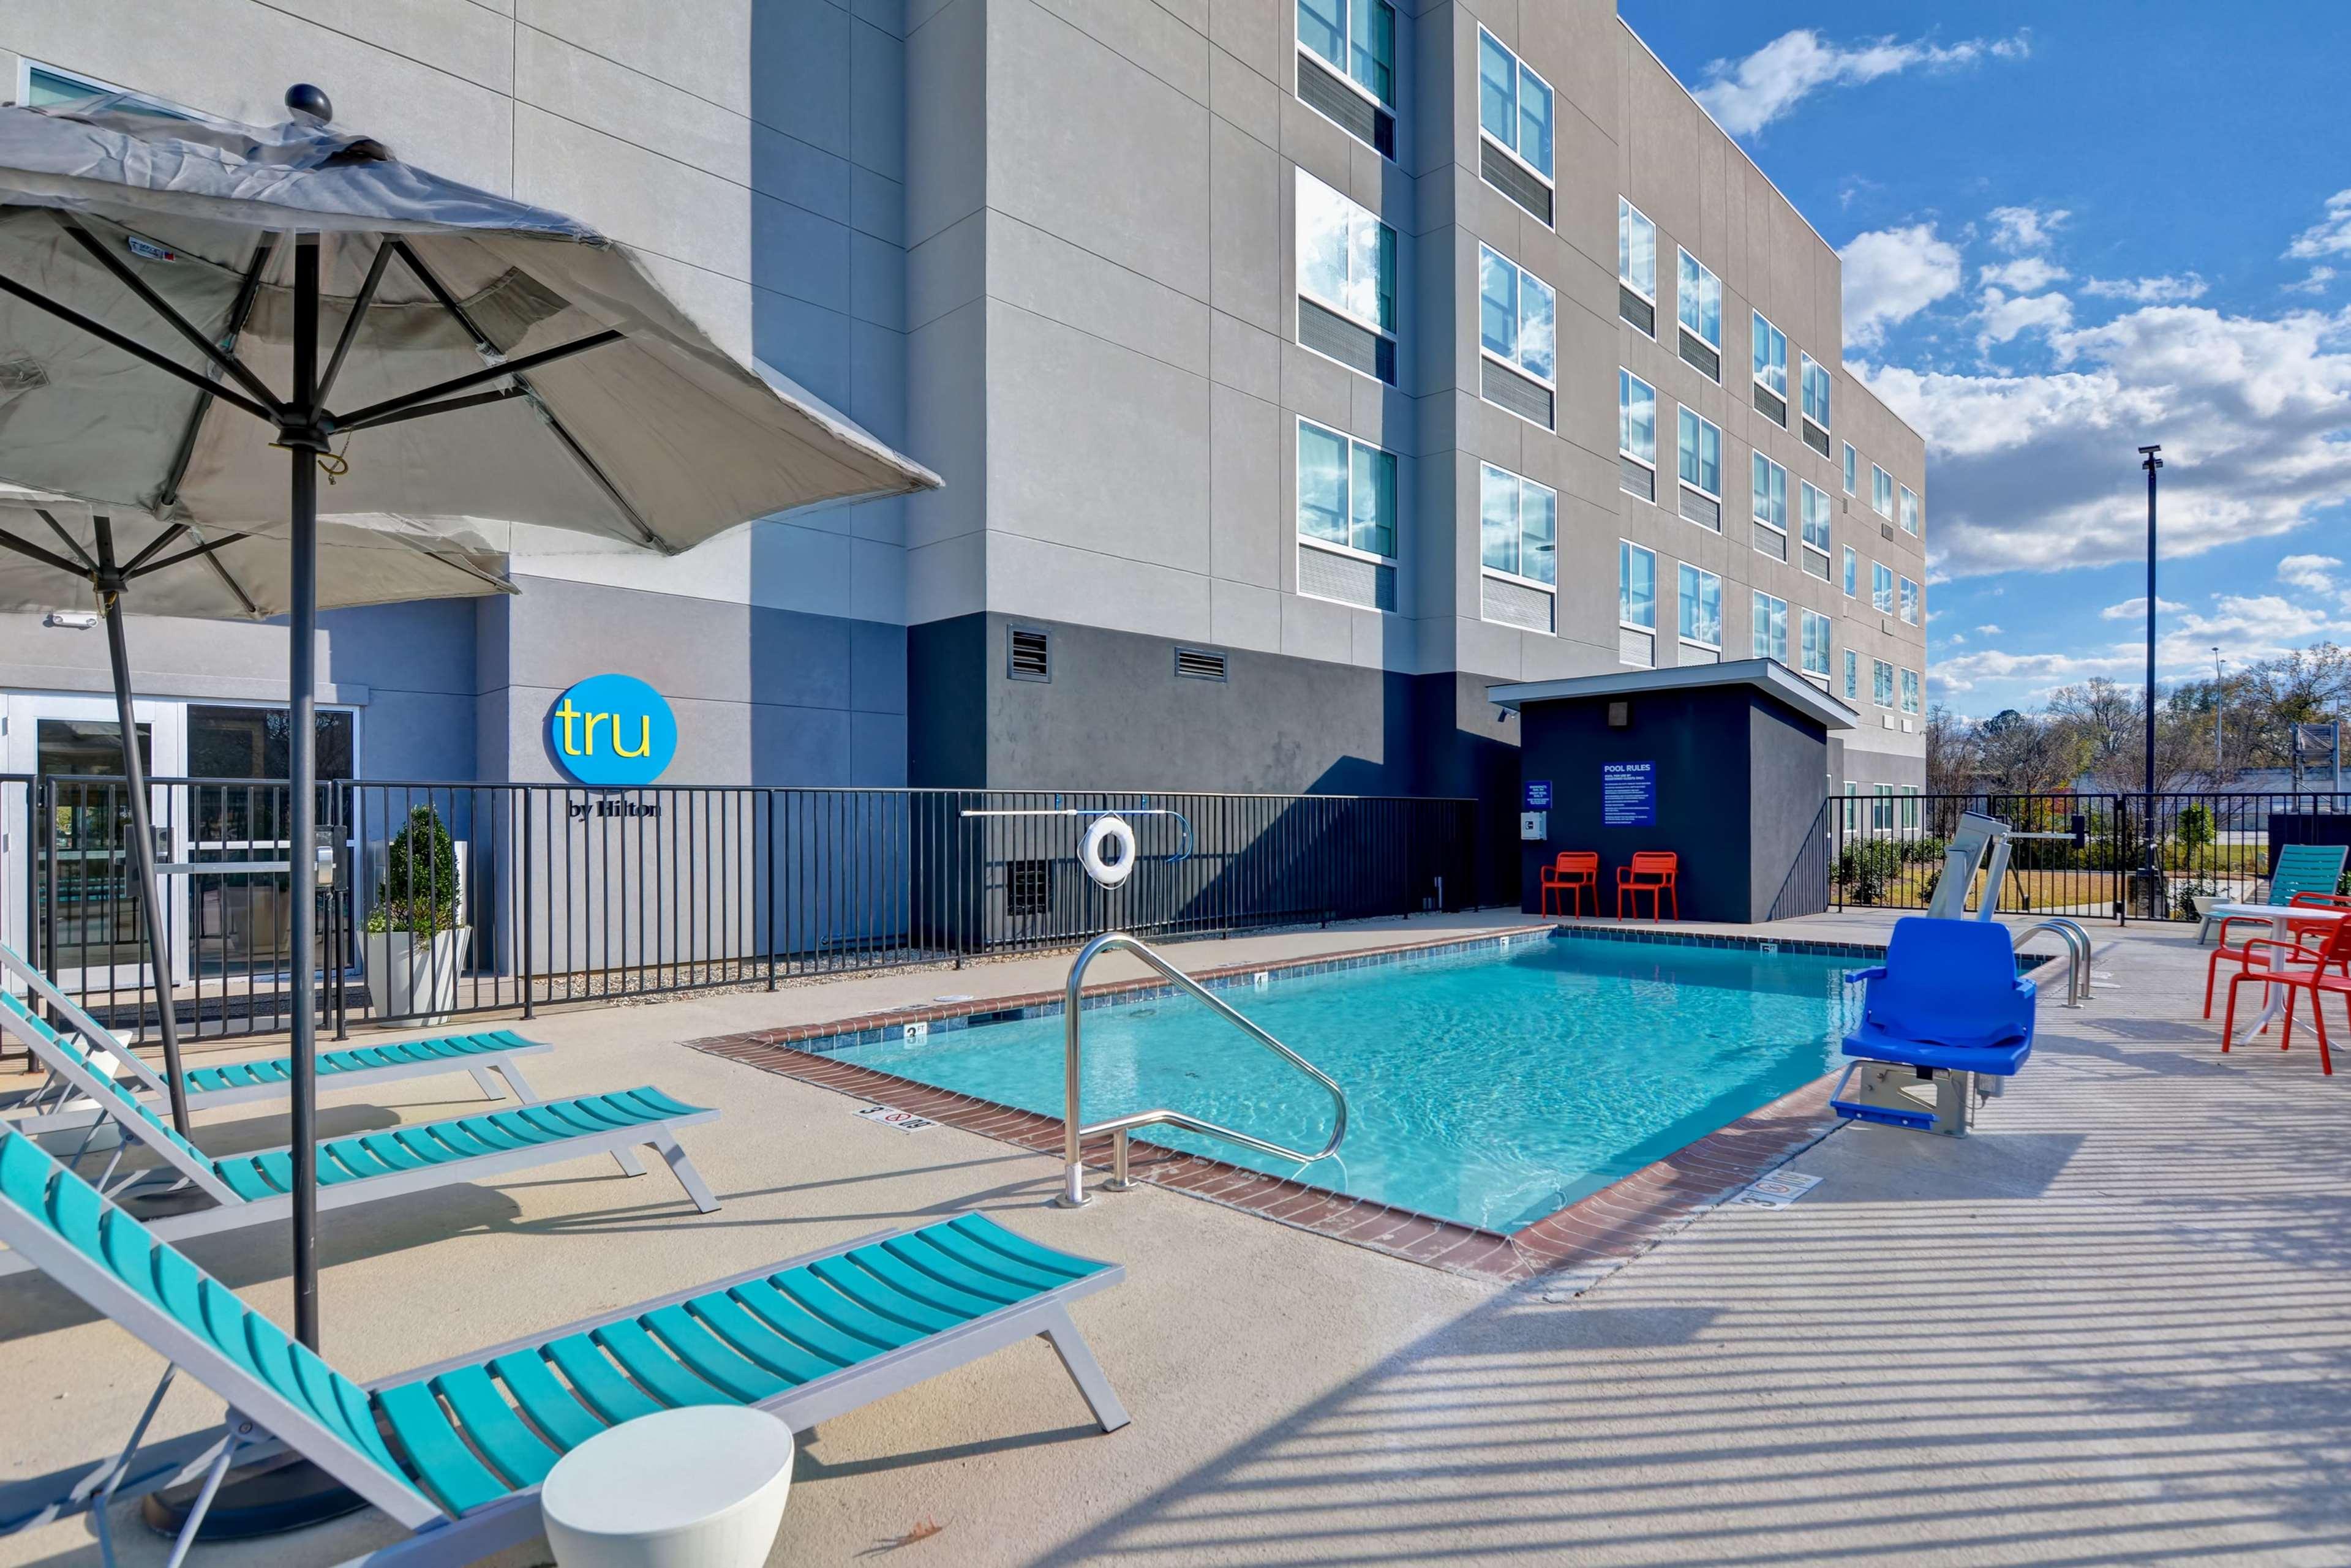 Tru by Hilton Baton Rouge Citiplace image 15